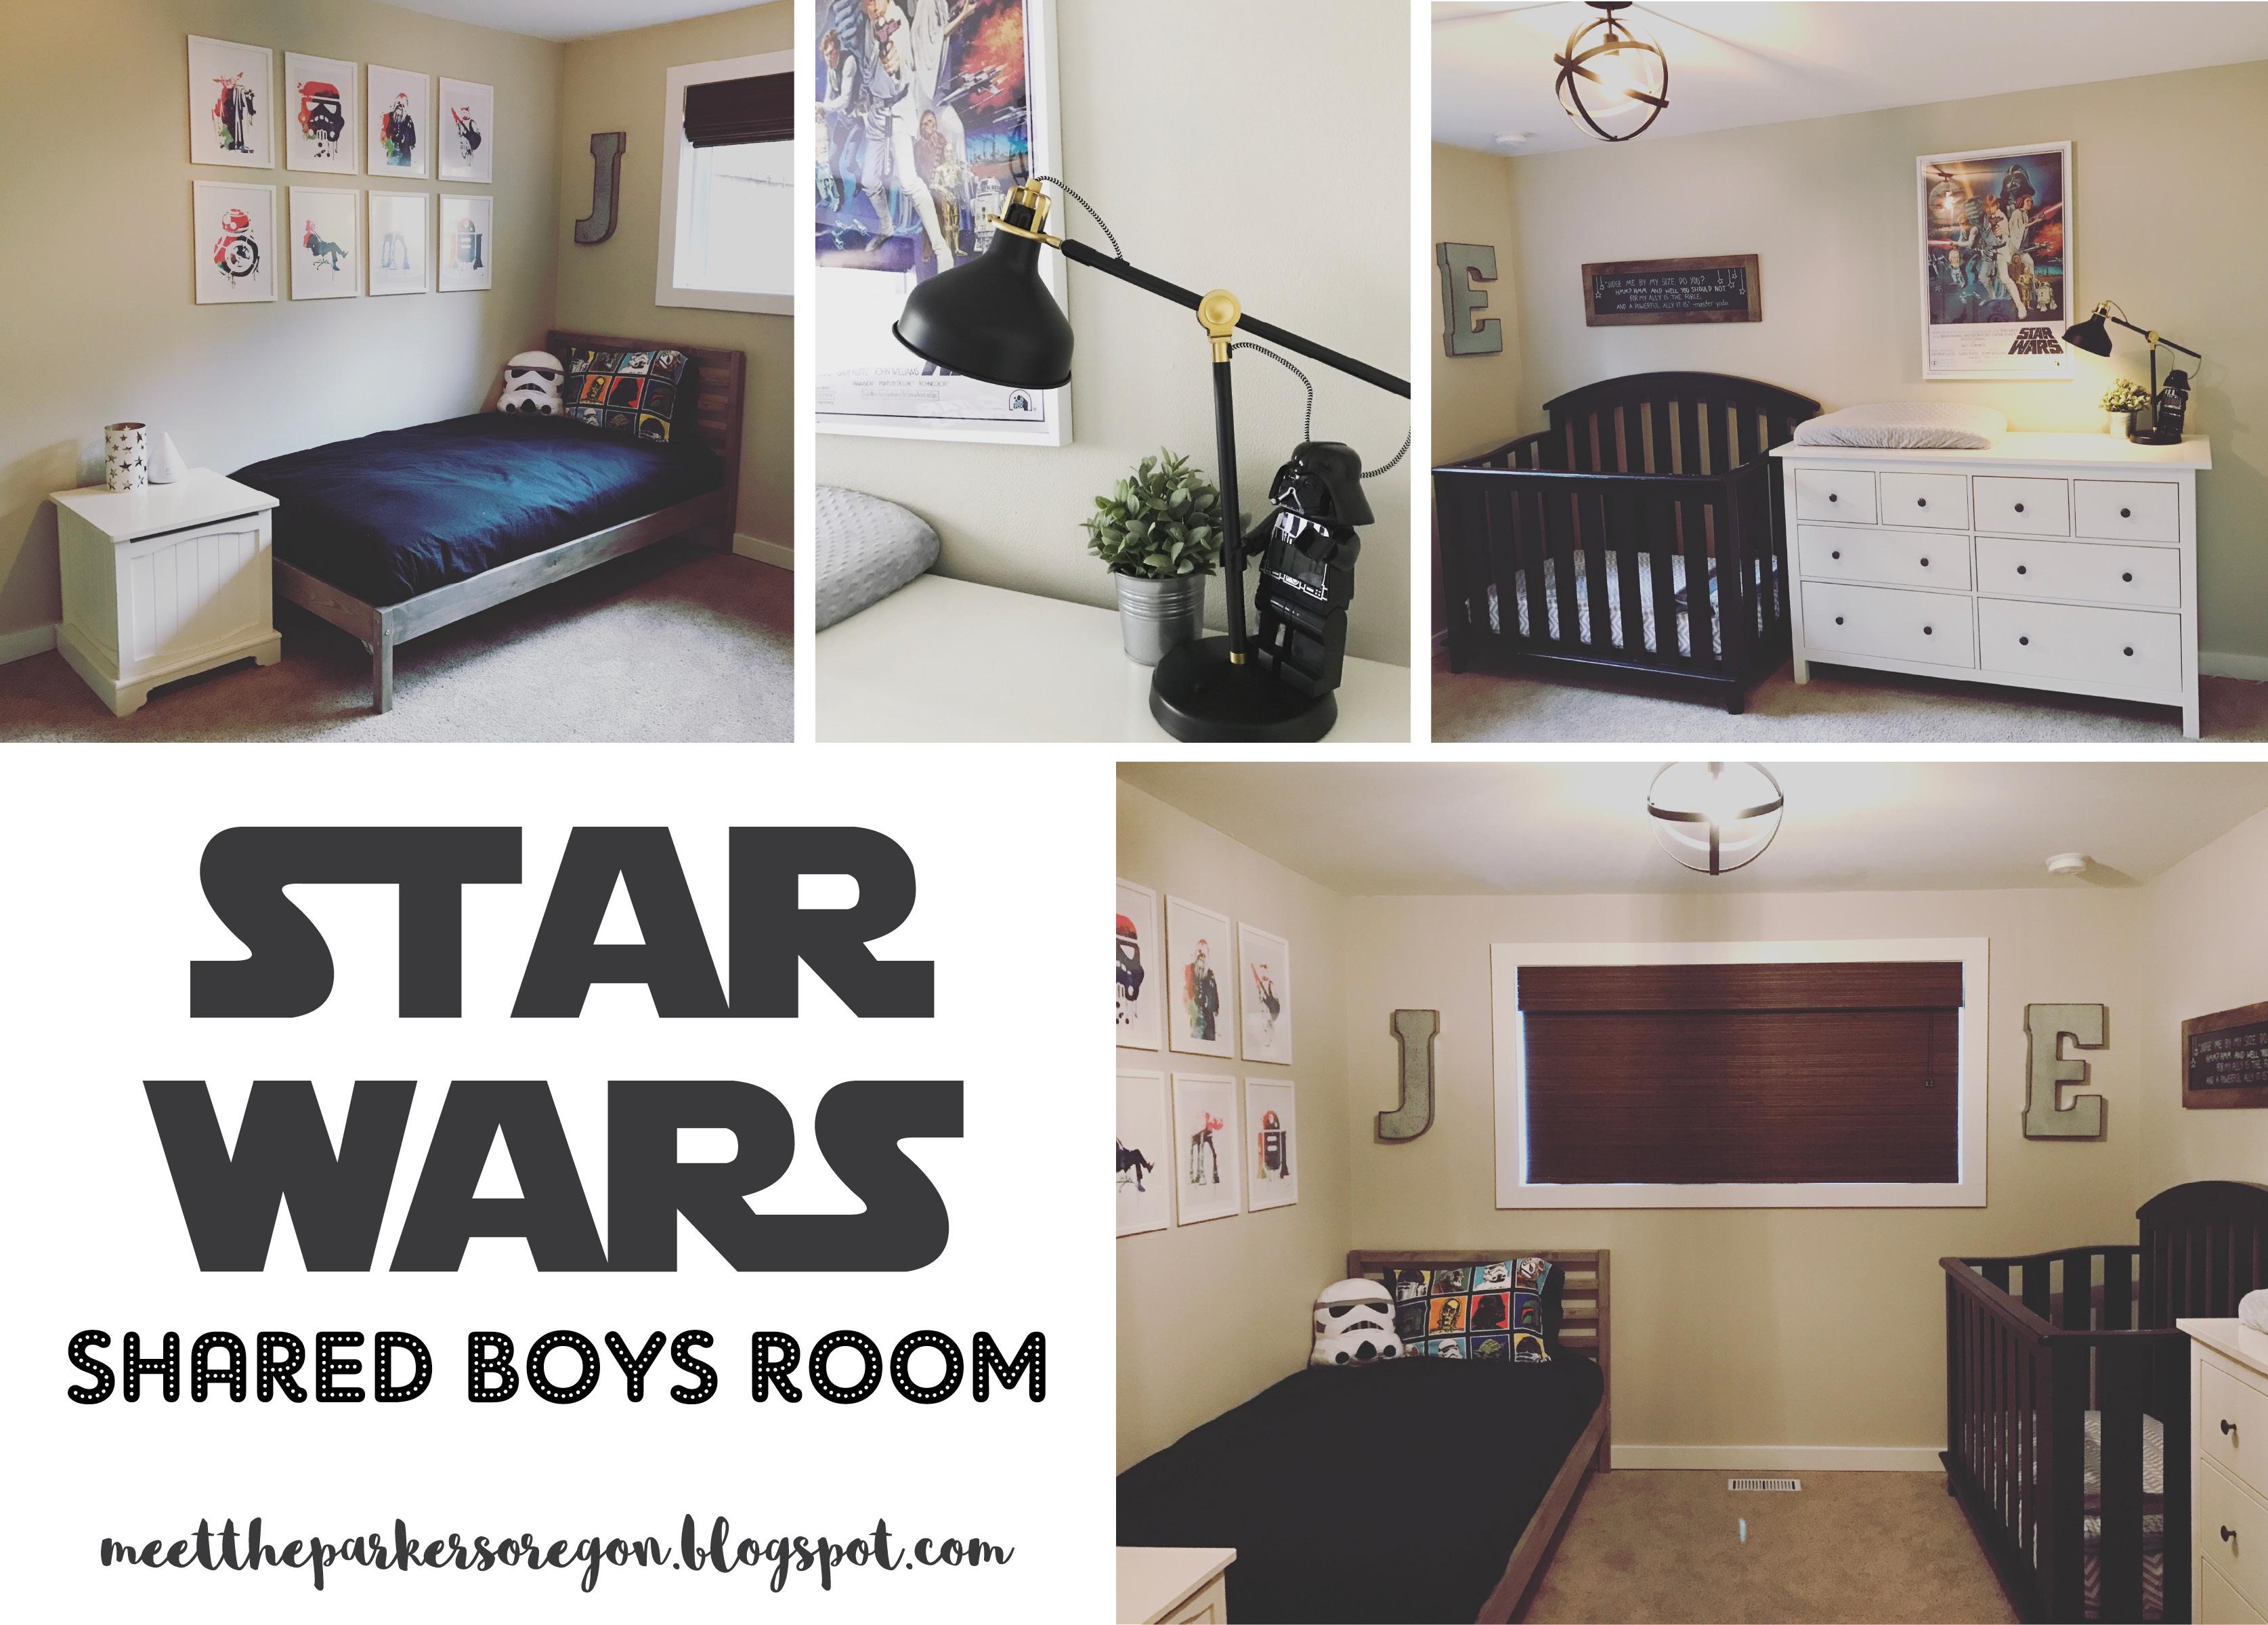 Star Wars Shared Boys Room Project Nursery